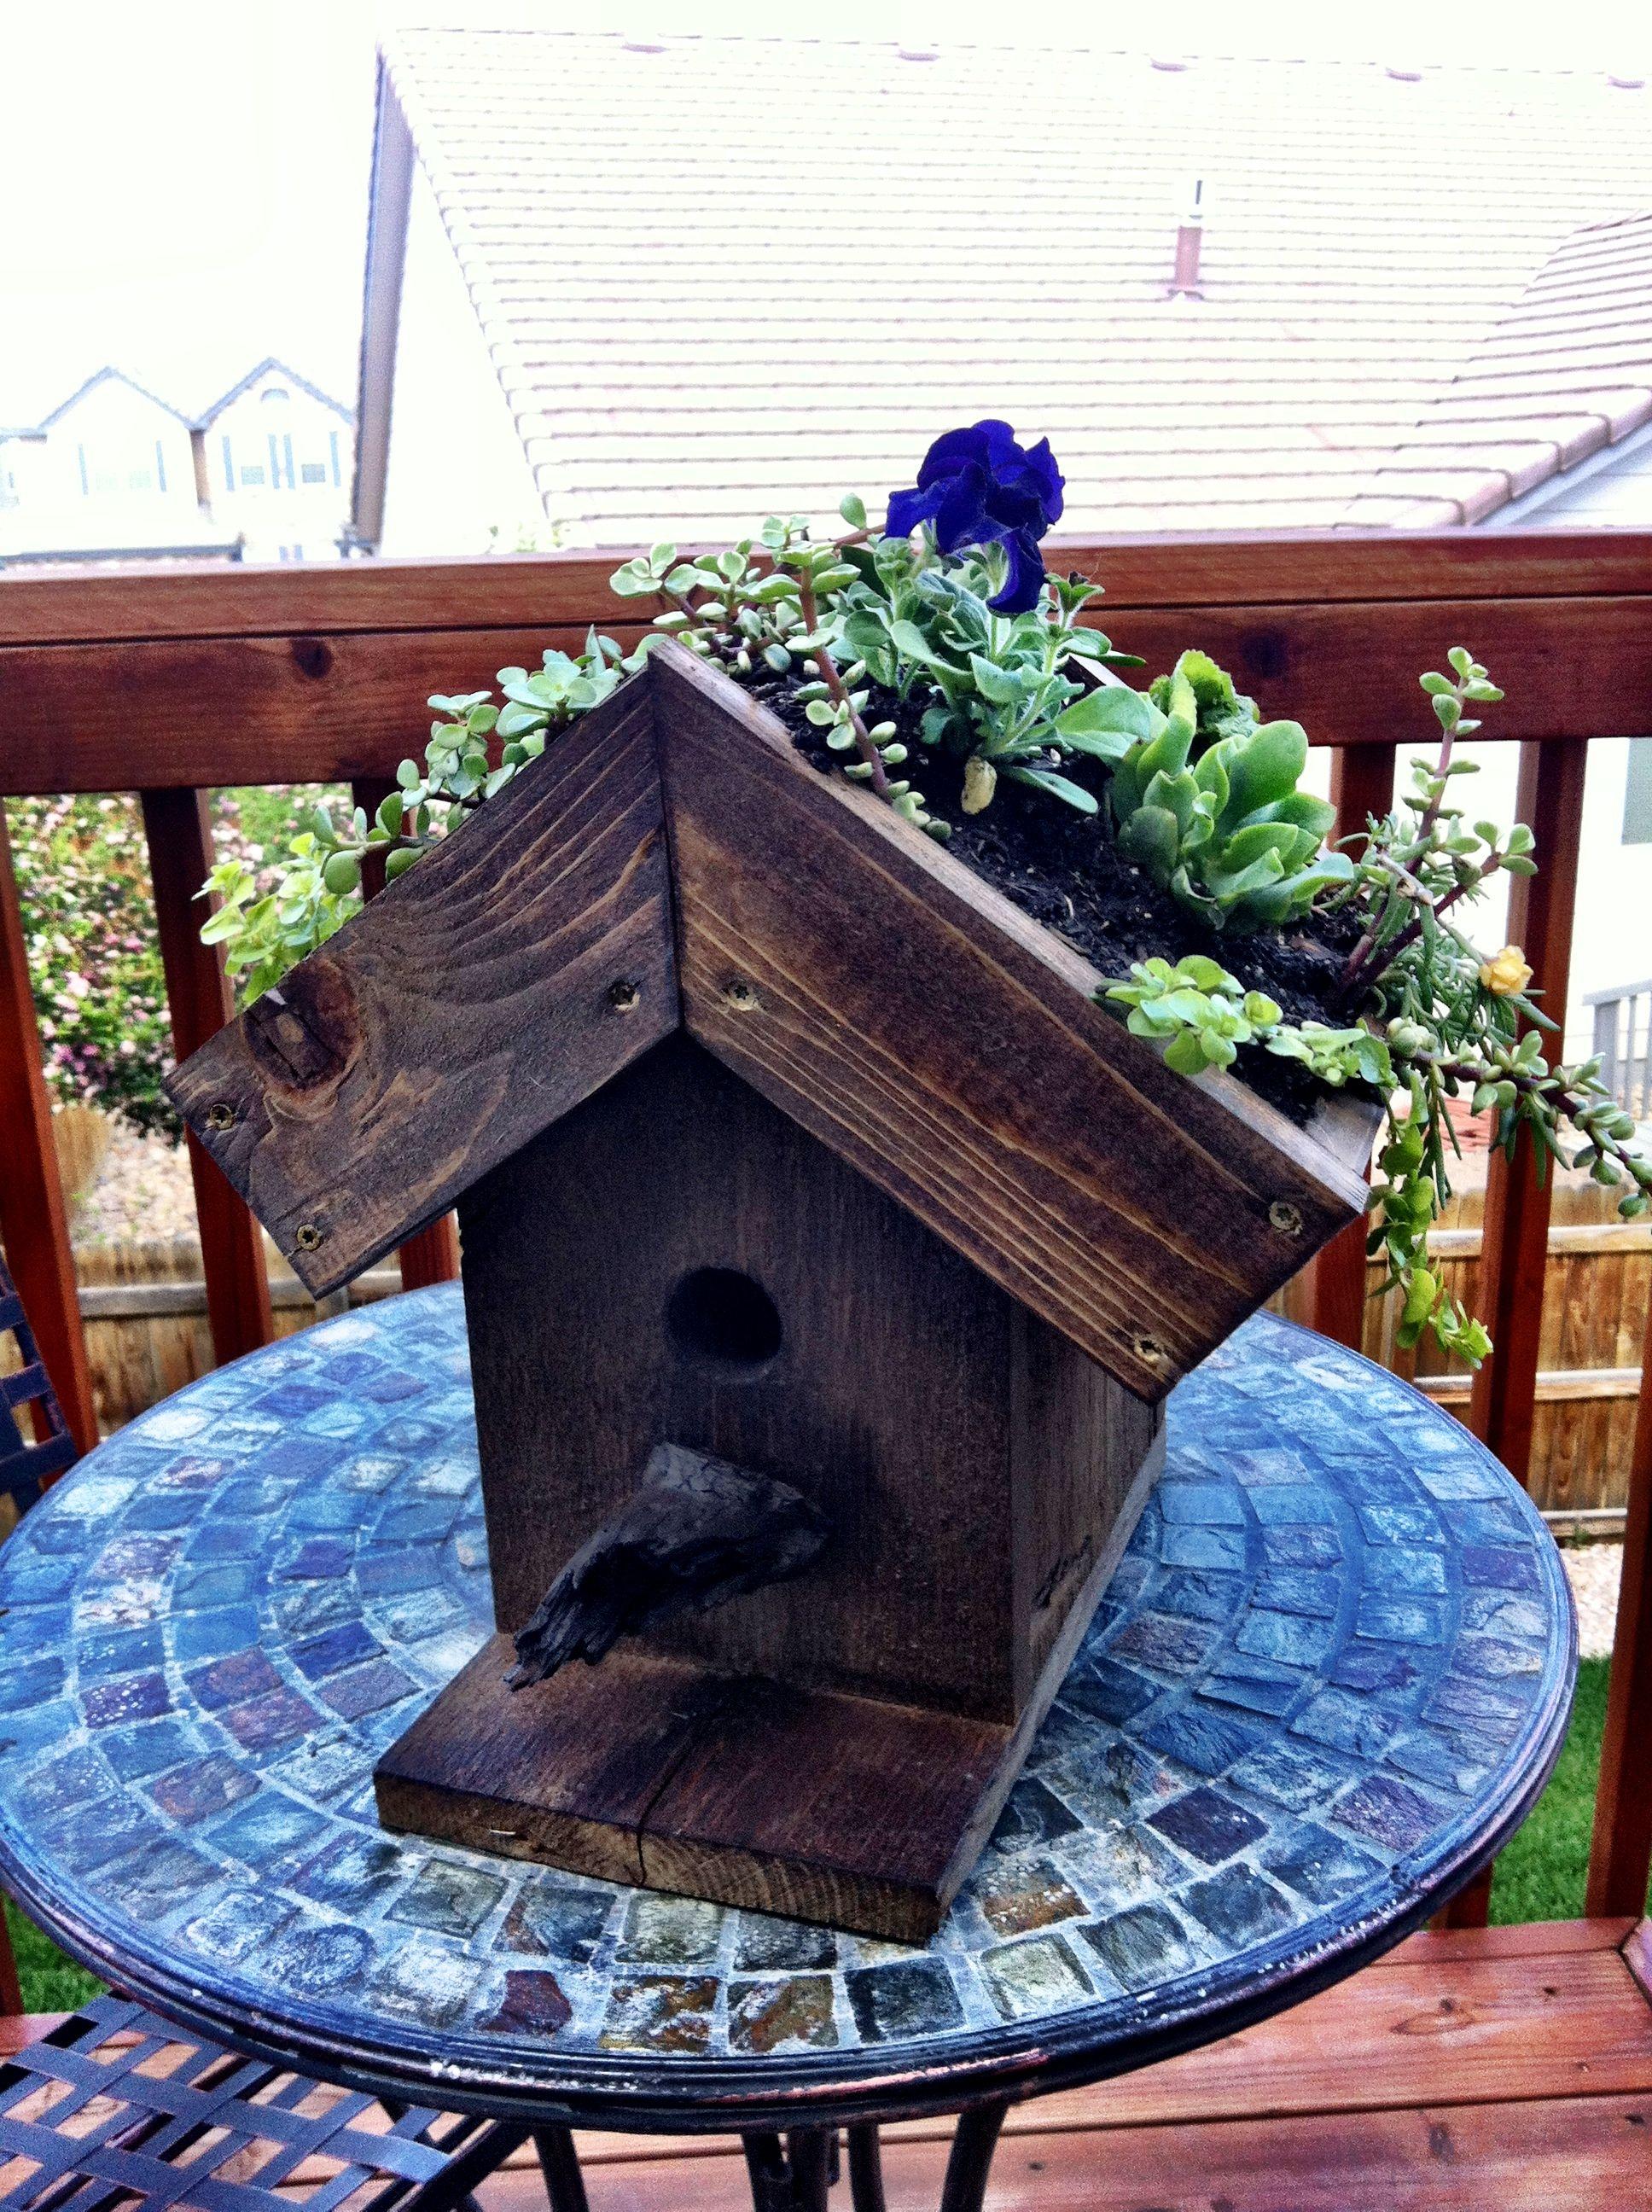 Living birdhouse